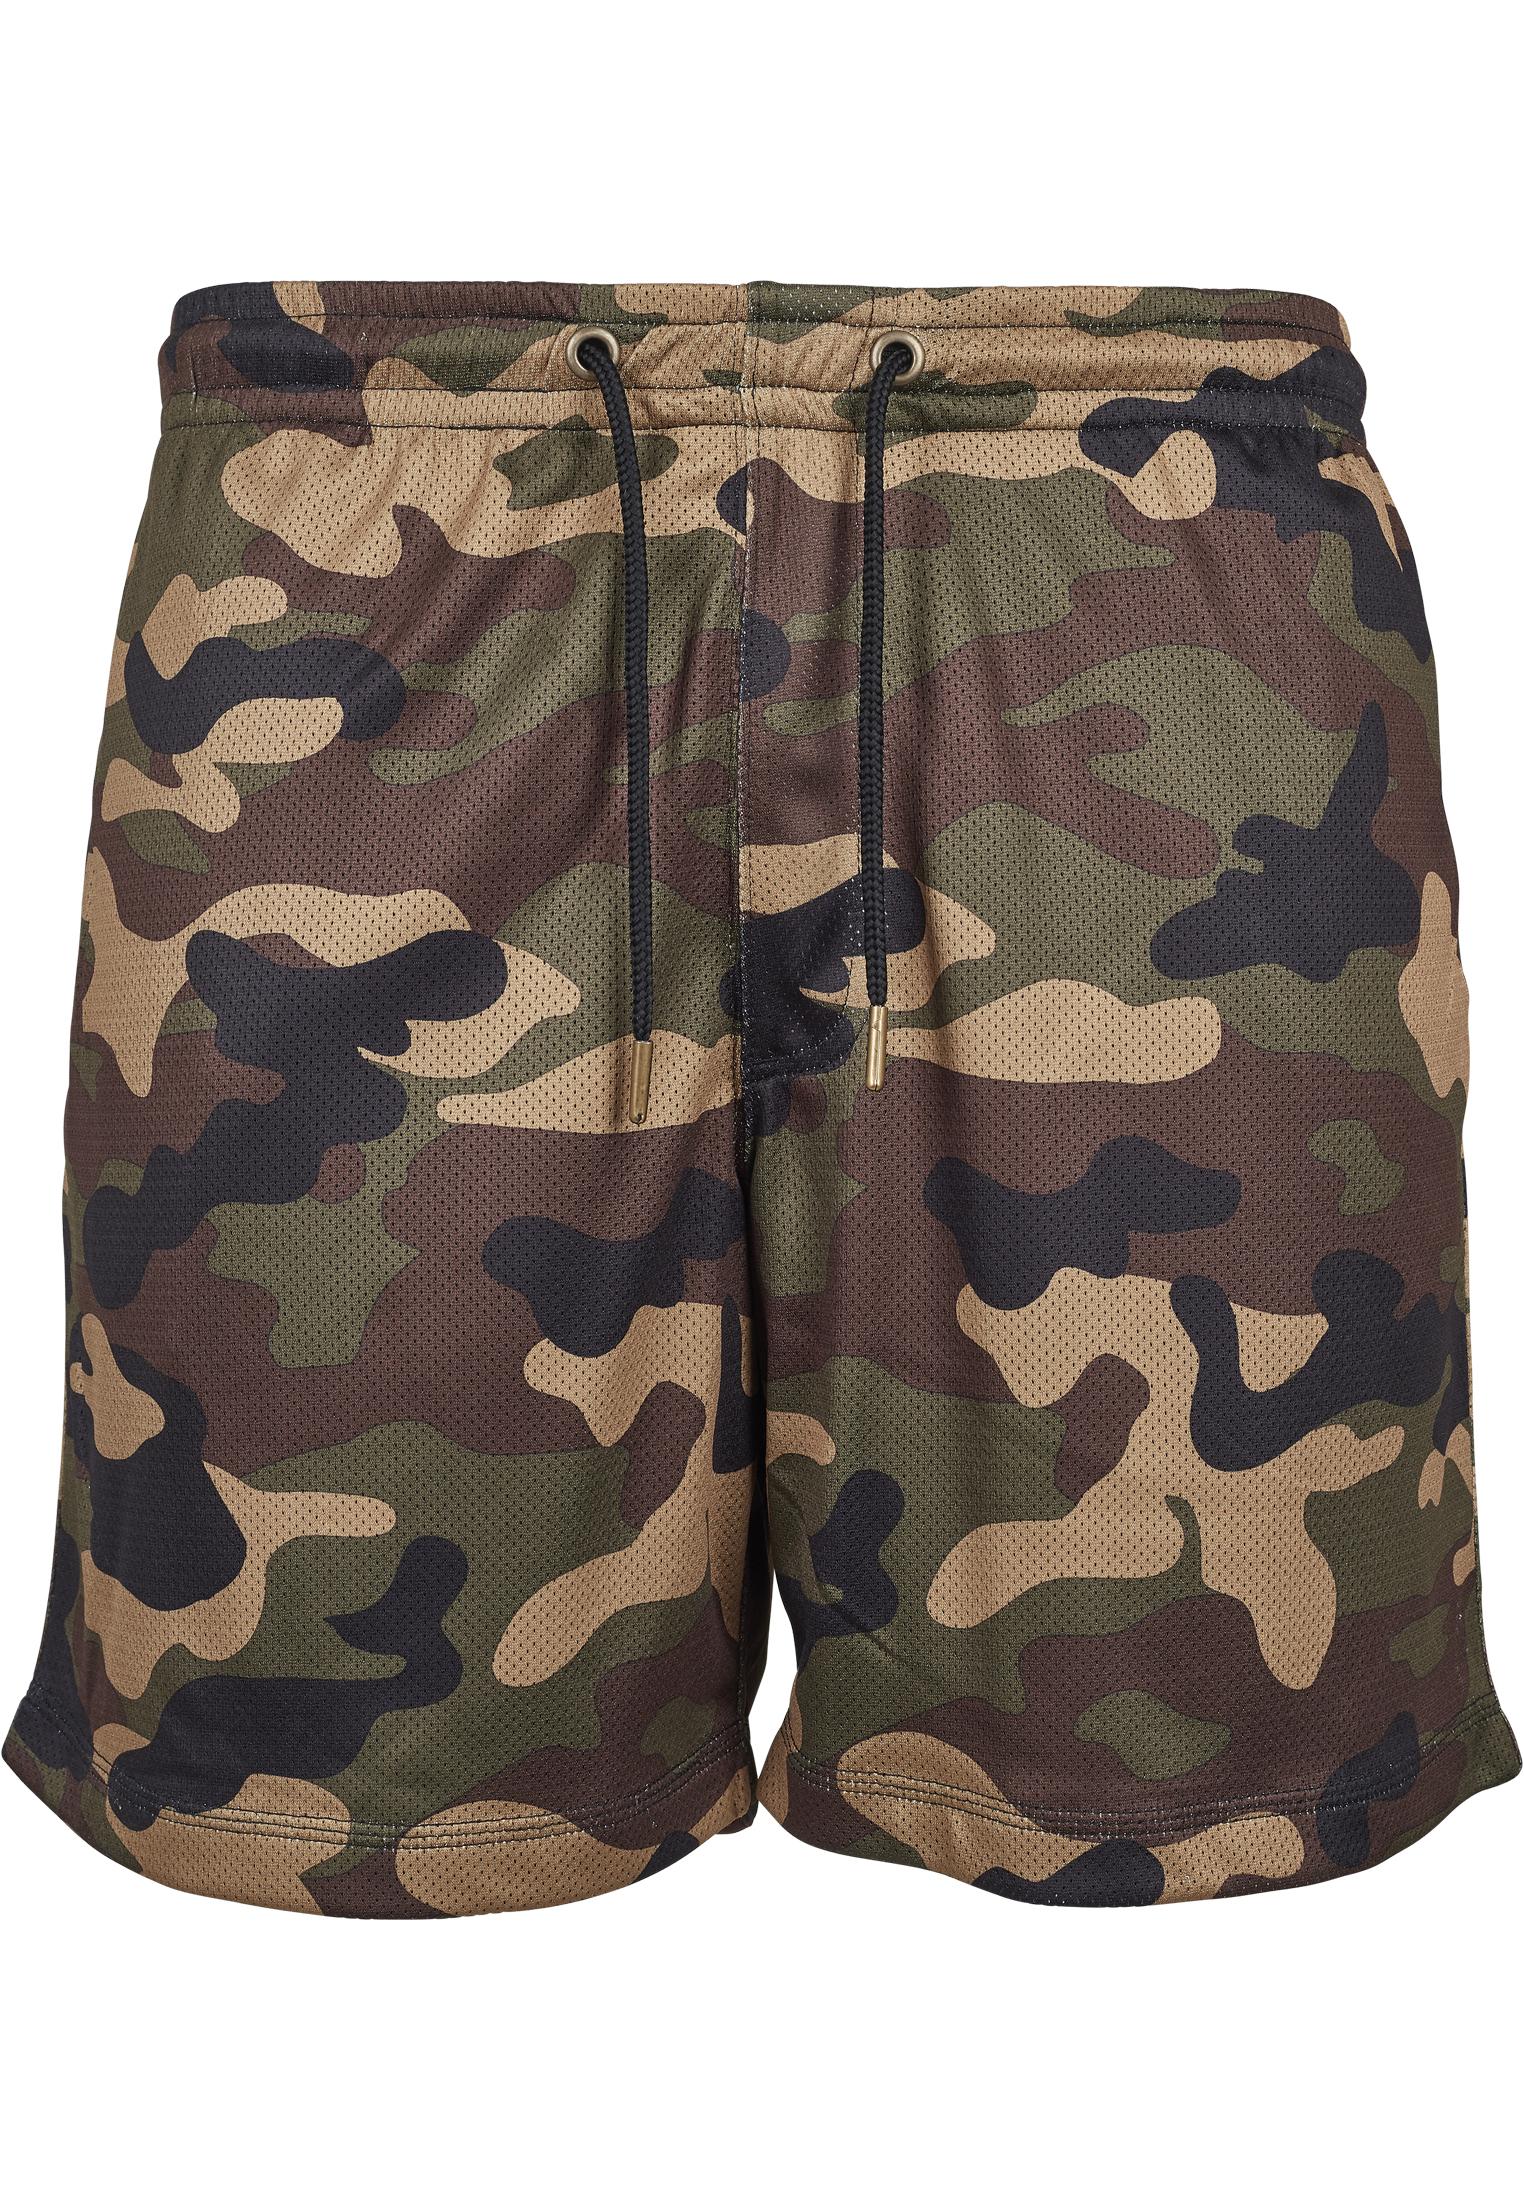 Mesh Shorts Camo